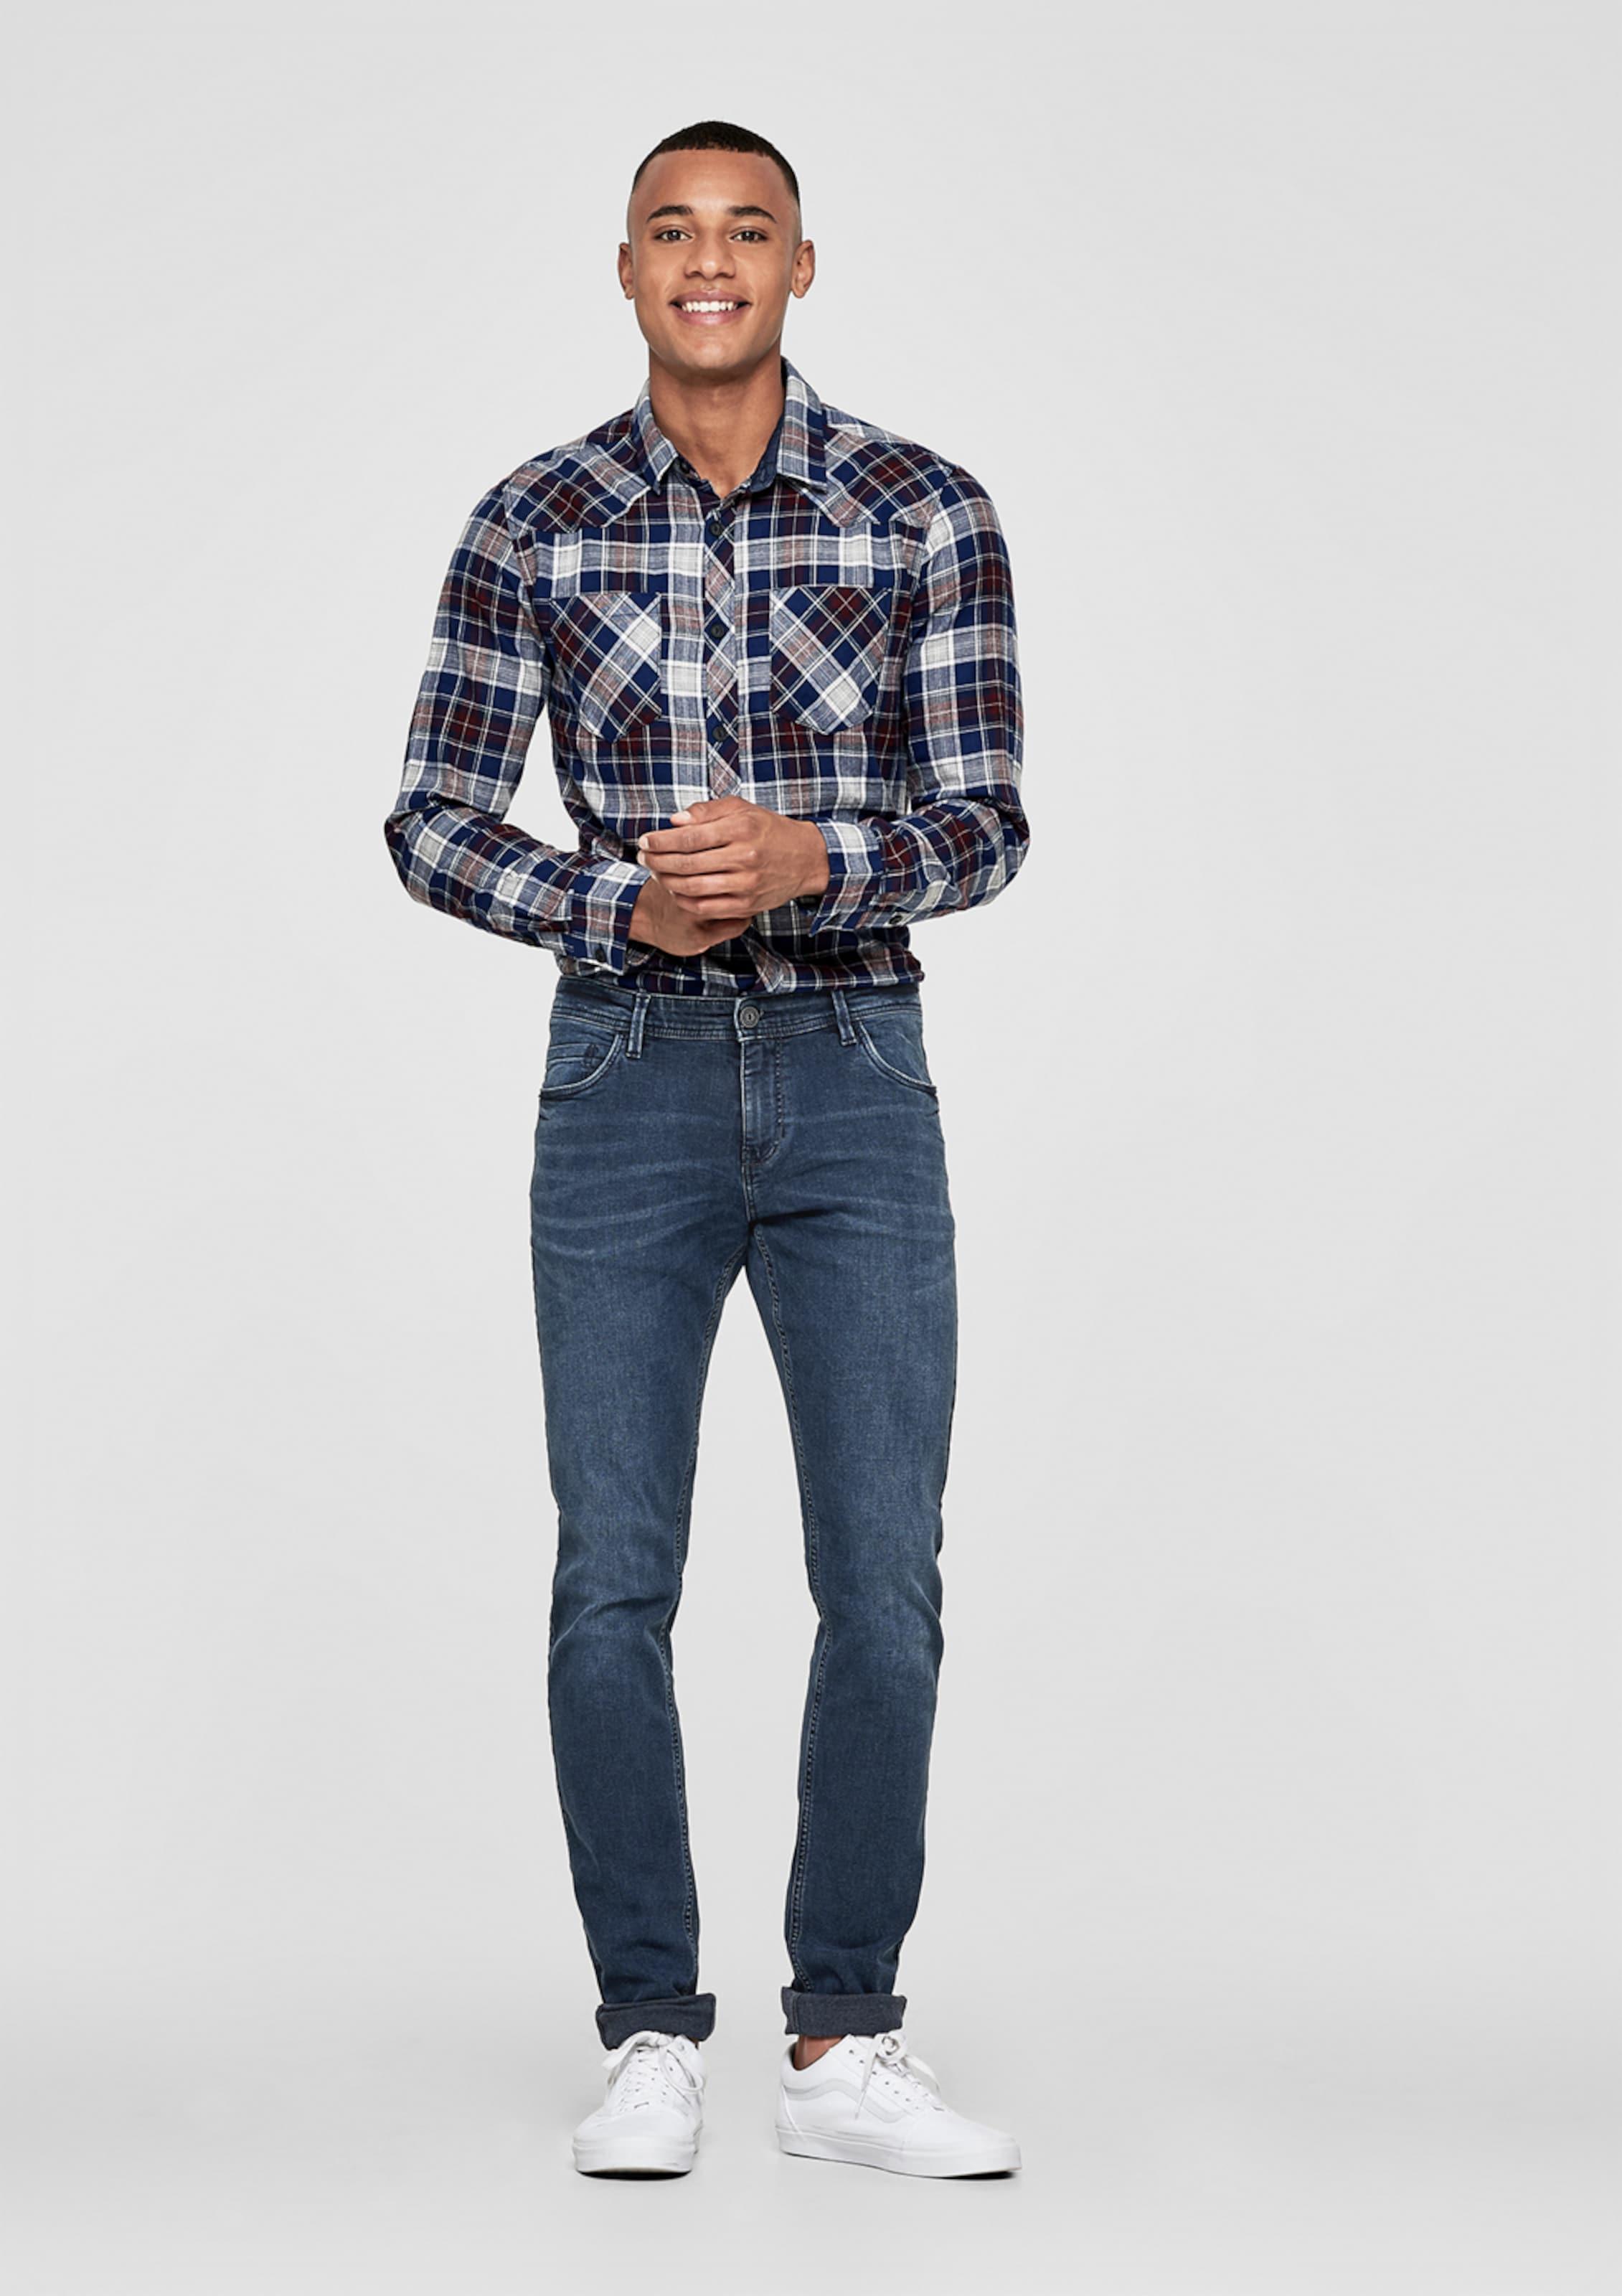 By Denim Blue Q Jeans Designed In 'gavin' s b7vYfgy6